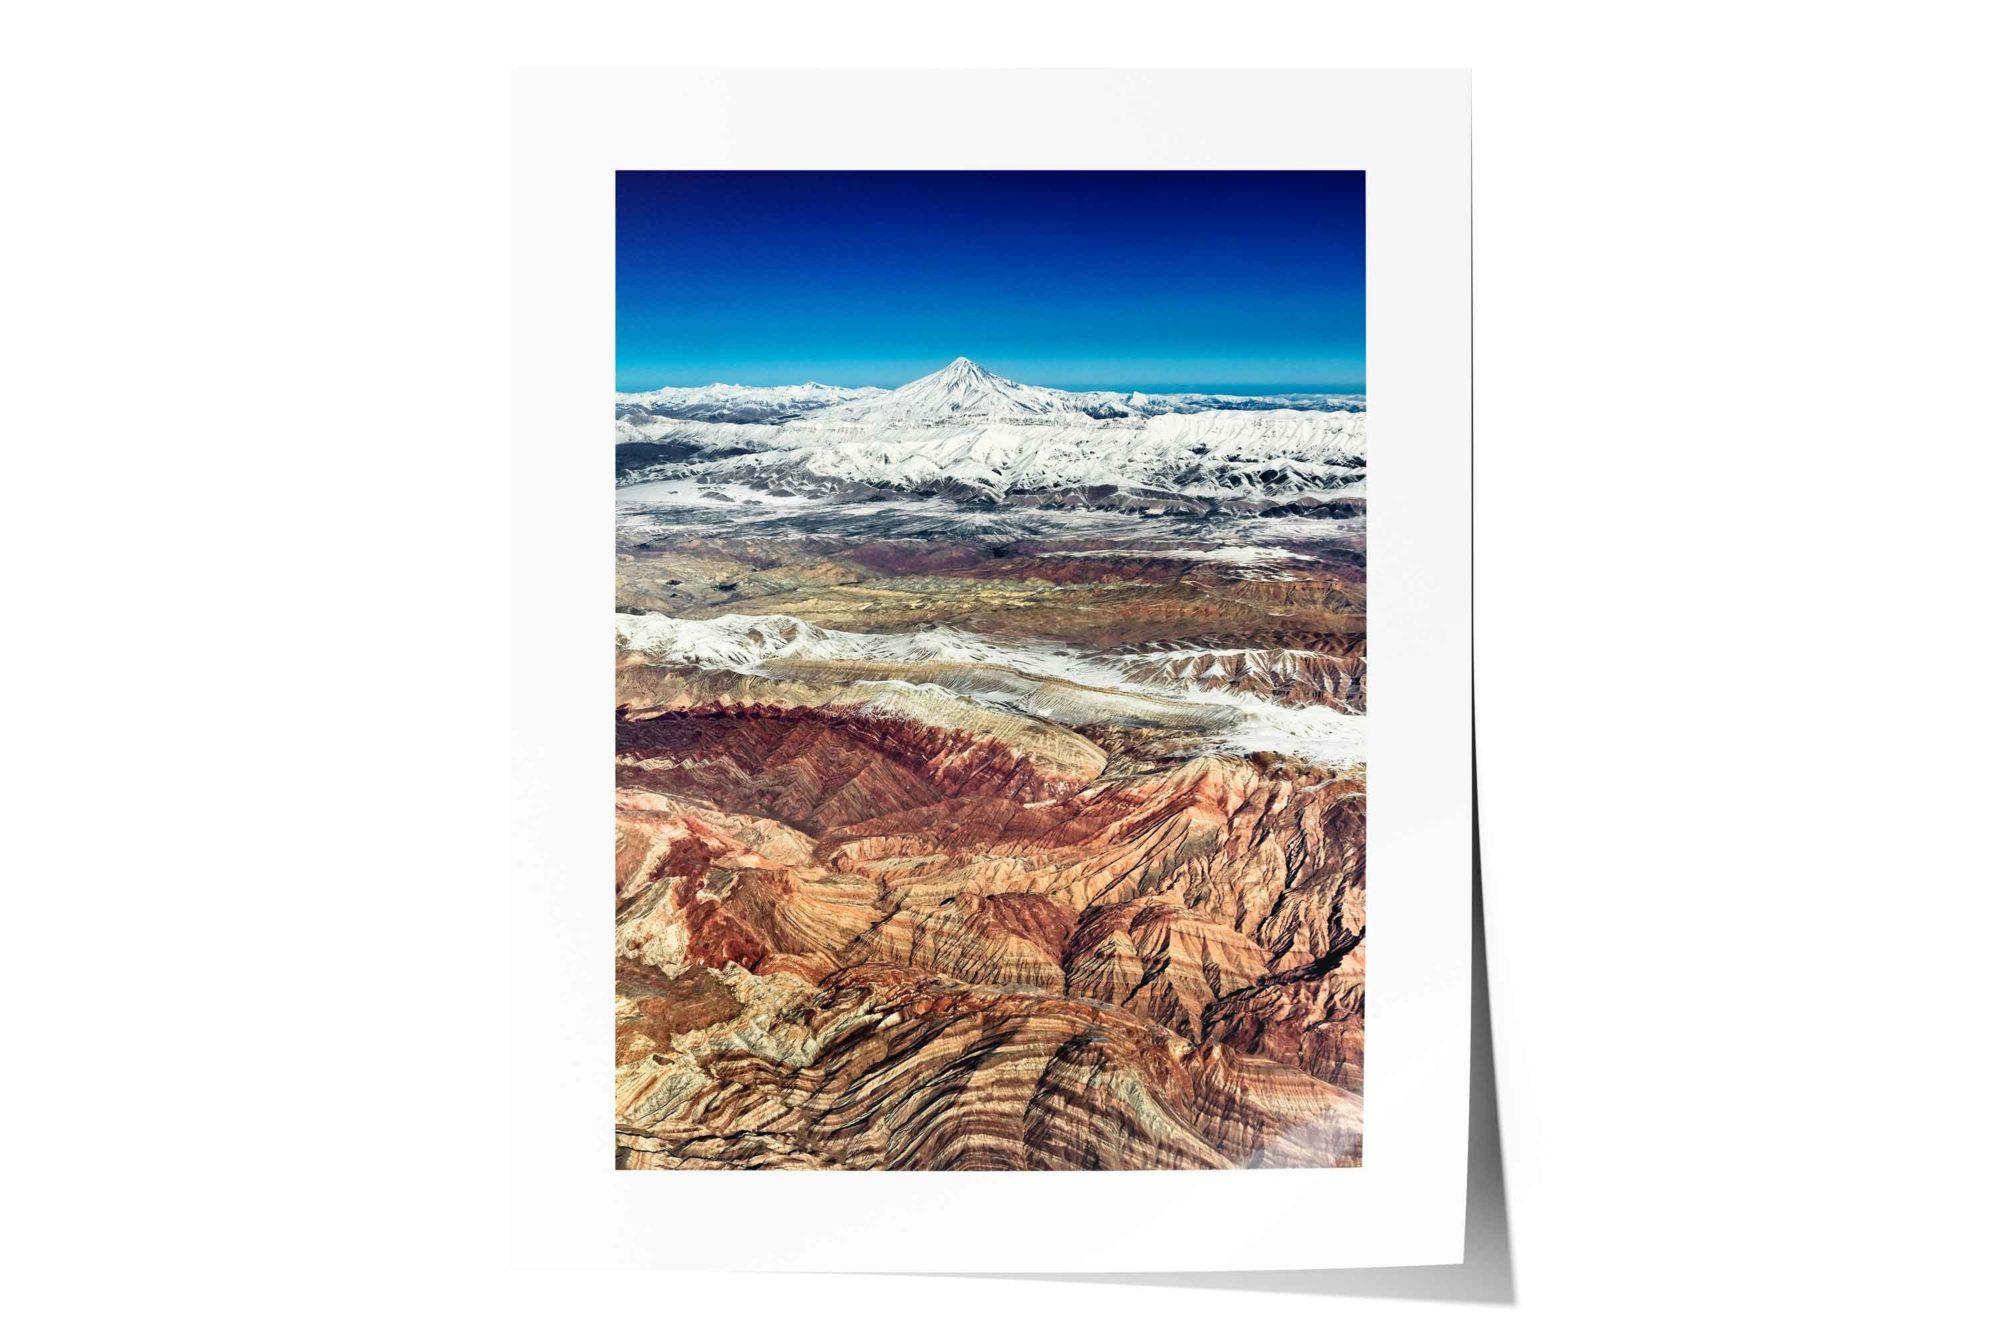 Mount Damavand (Donbavand), Lar National Park, Alborz Range, Close to Tehran, Iran